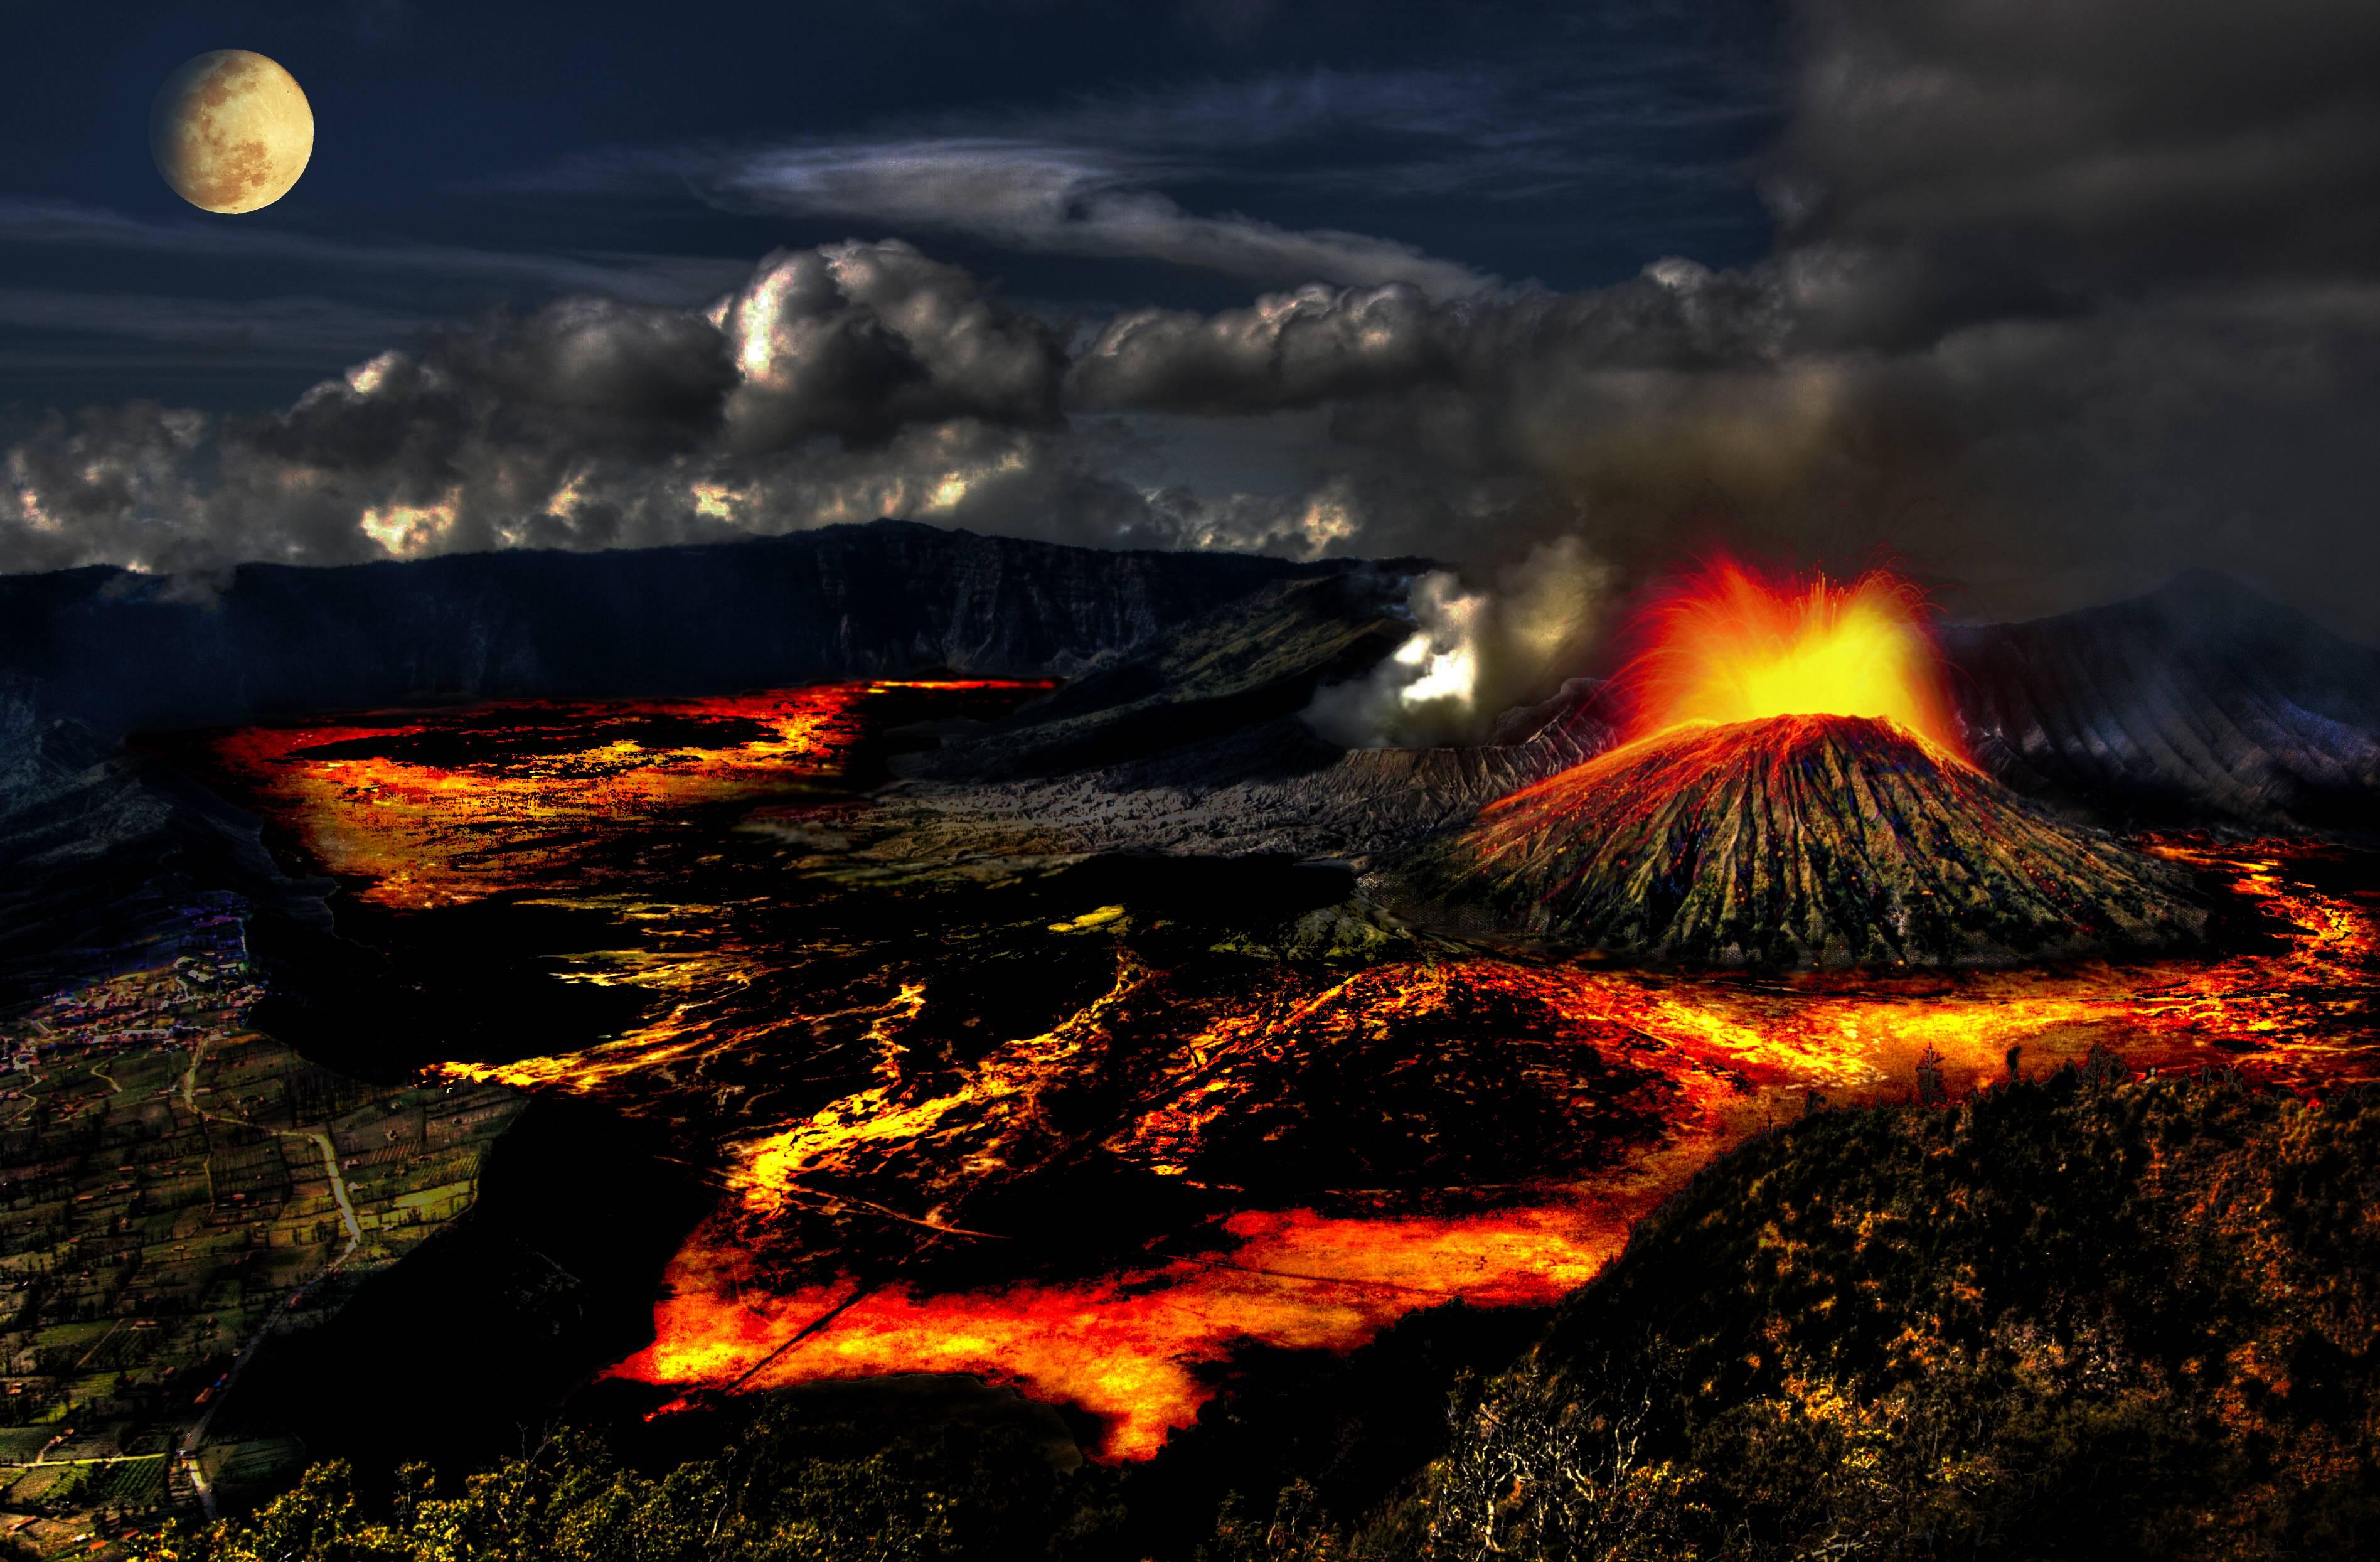 Background information on volcanoes